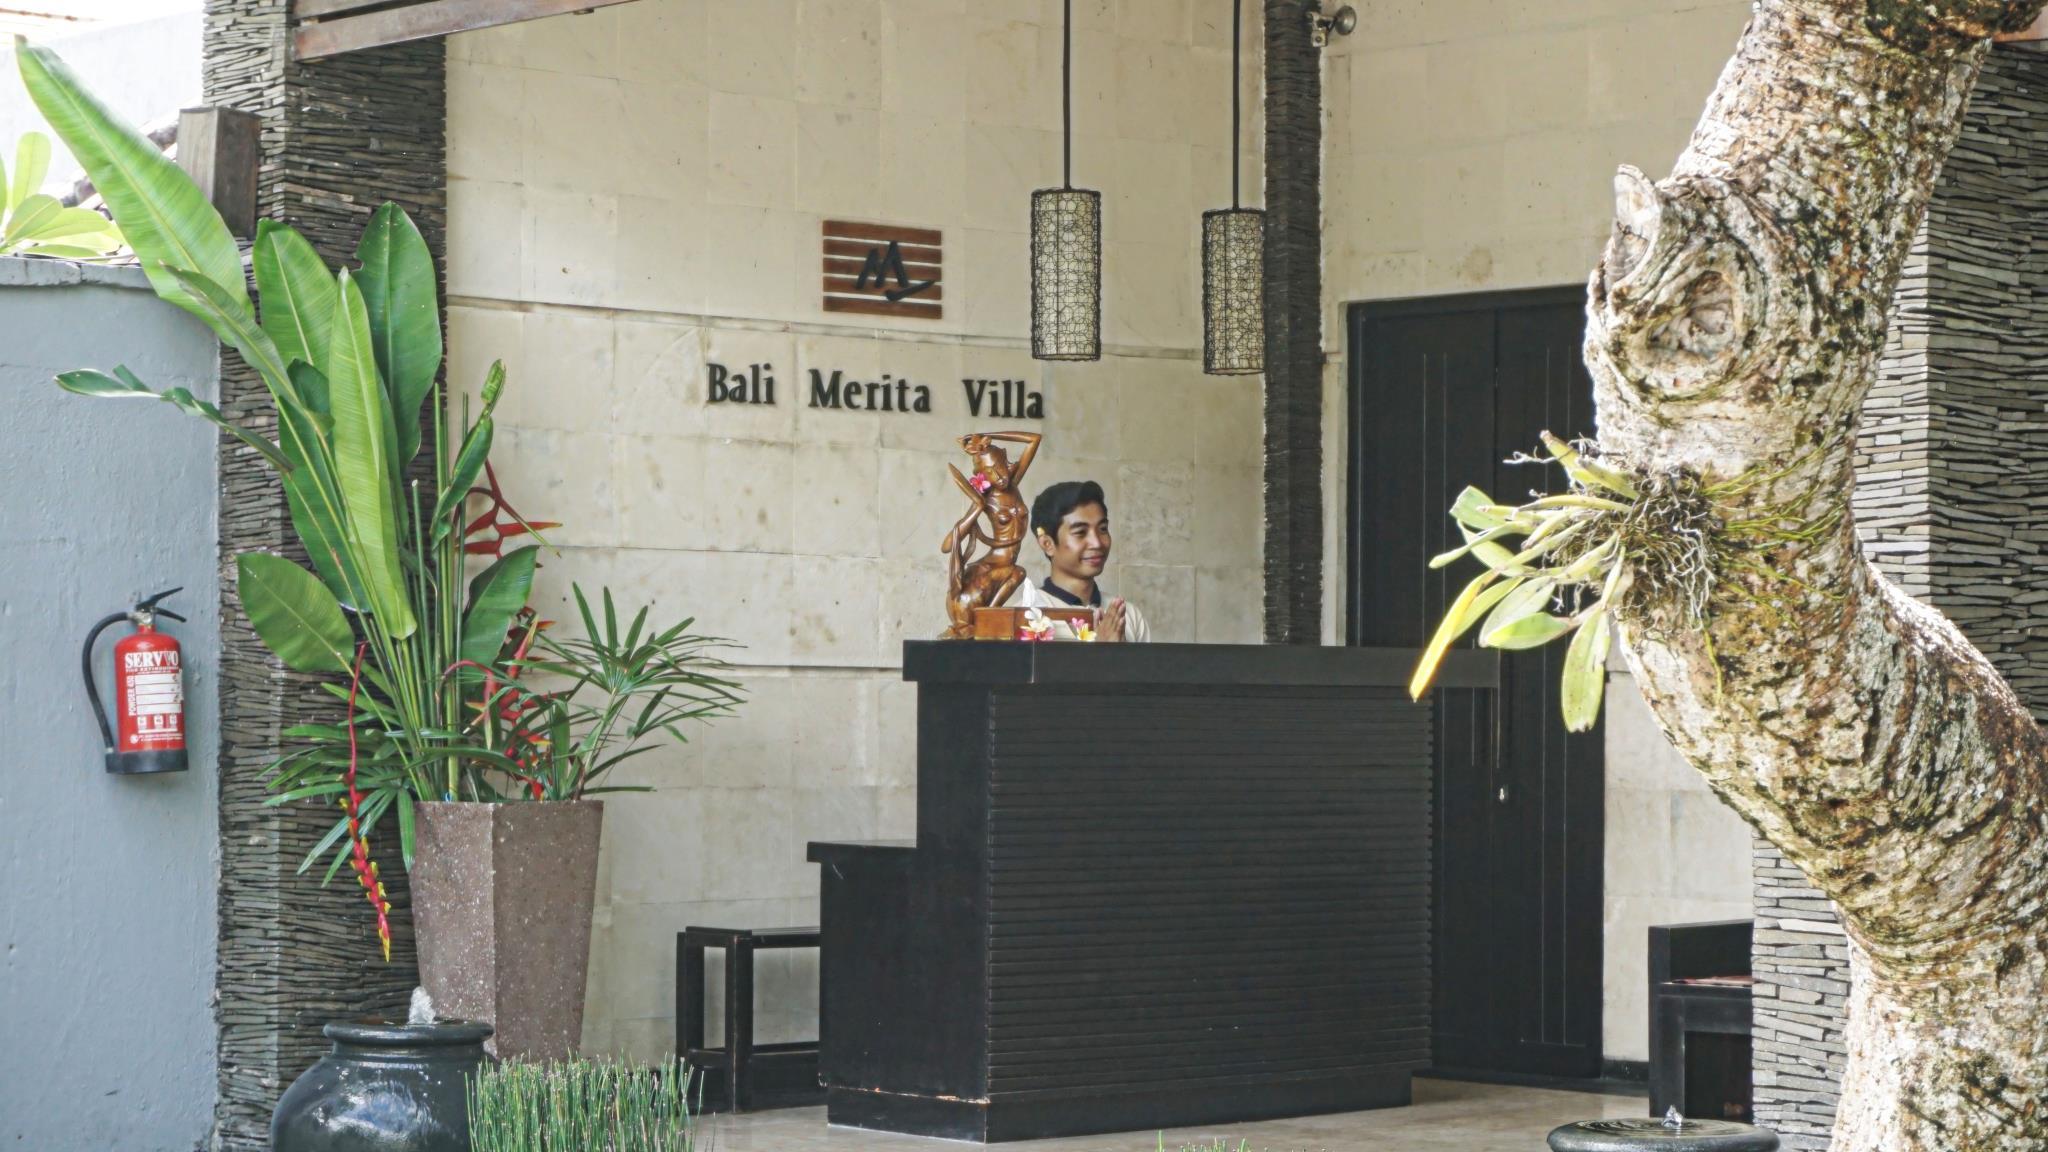 Bali Merita Villa ホテル詳細